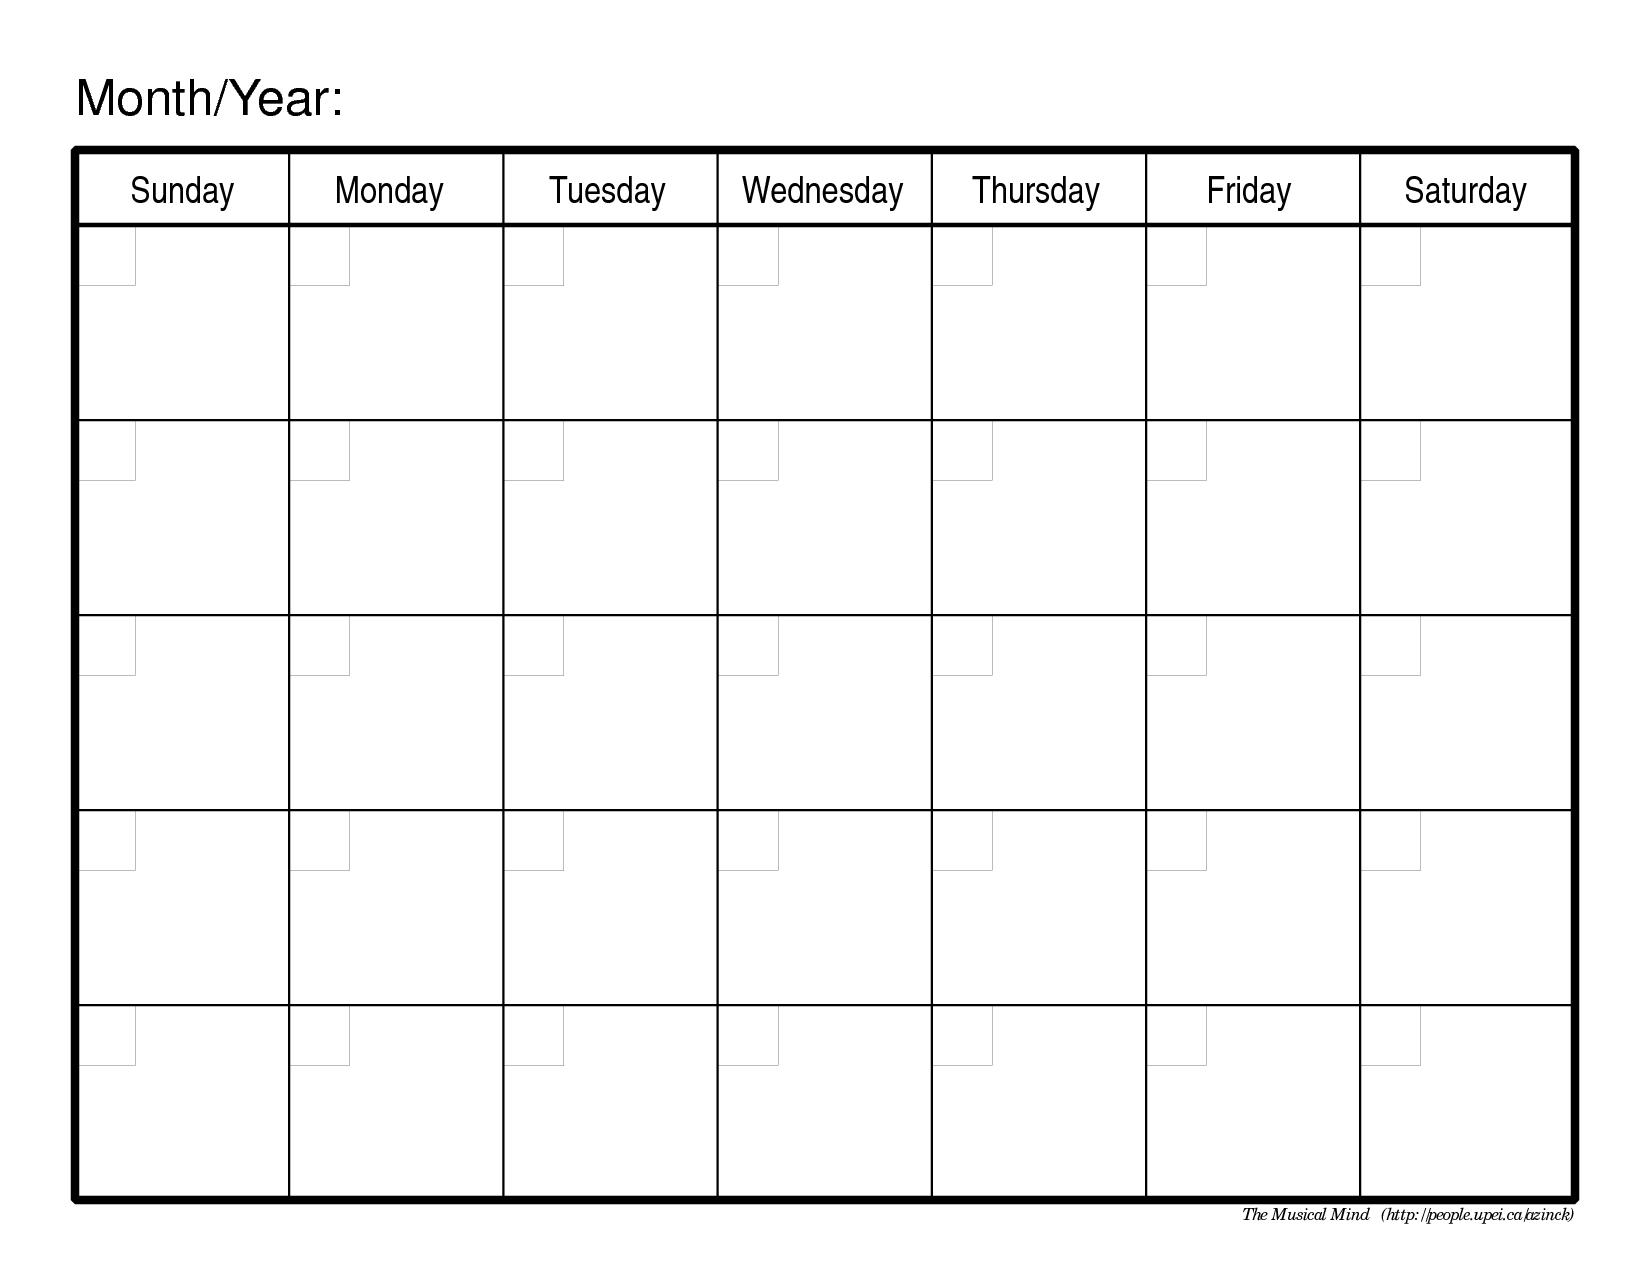 Calendar Templates Printable Free Fieldstation.co | Self Discovery regarding Blank Monthly Calendar Print Out